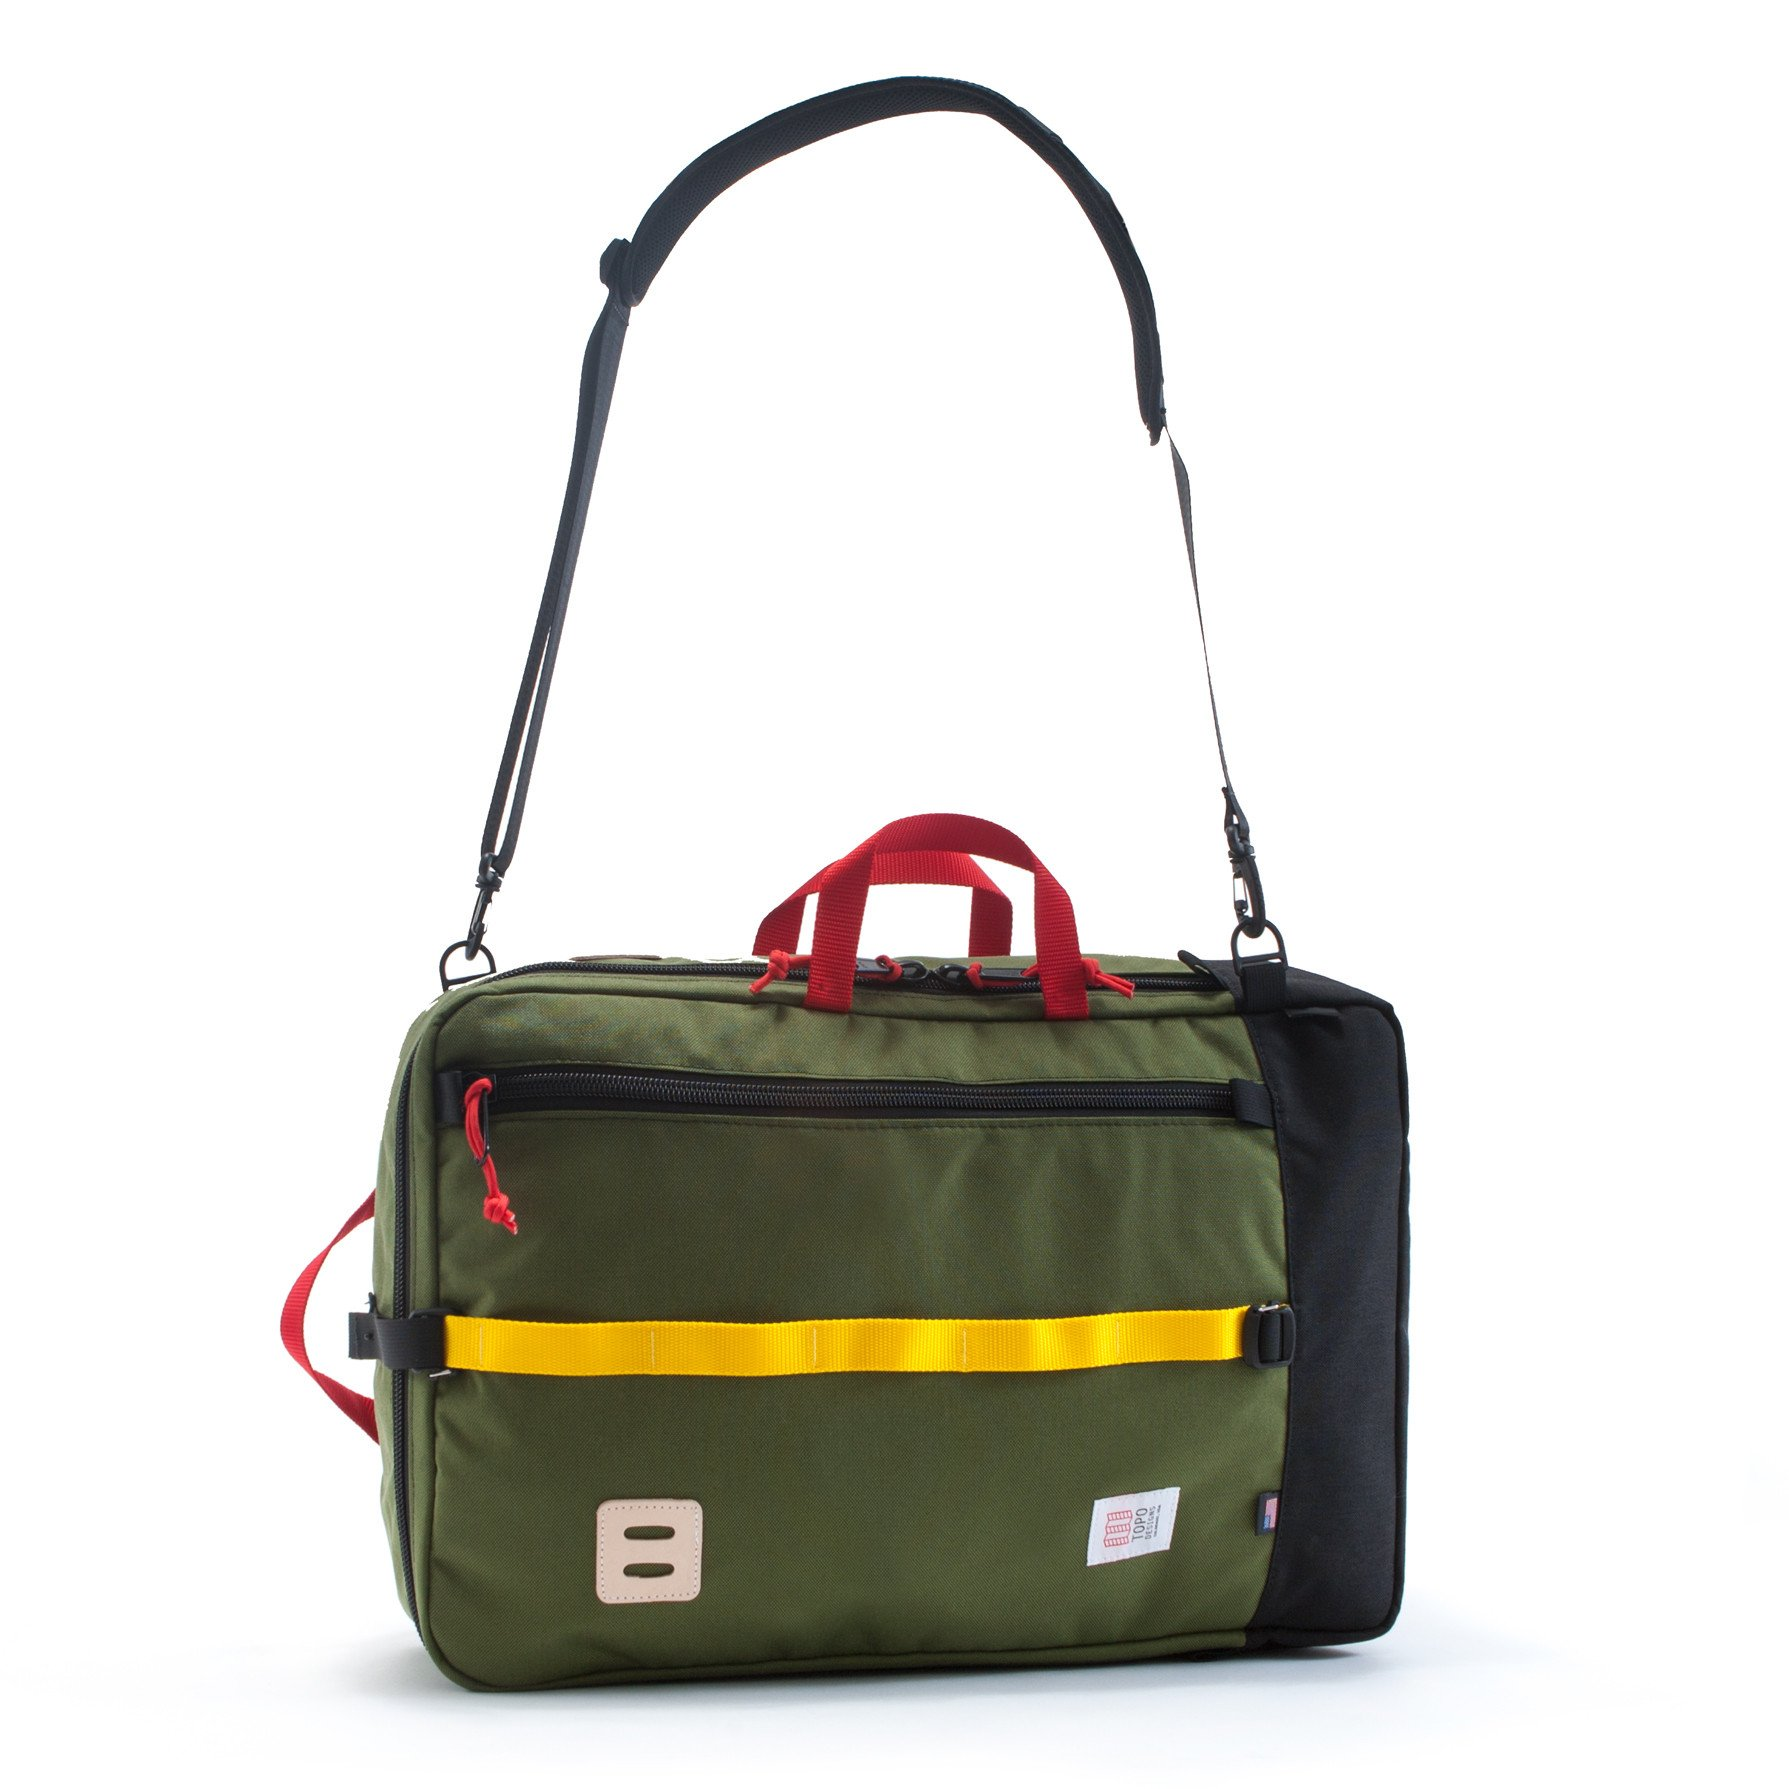 travel bags travel bag | topo designs - made in colorado, usa | topo designs nubxvrq